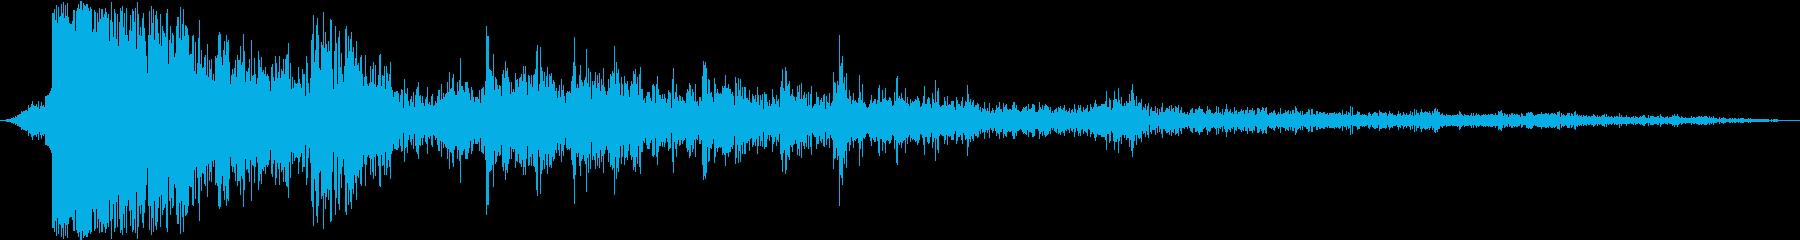 BIG BOOMING THUND...の再生済みの波形